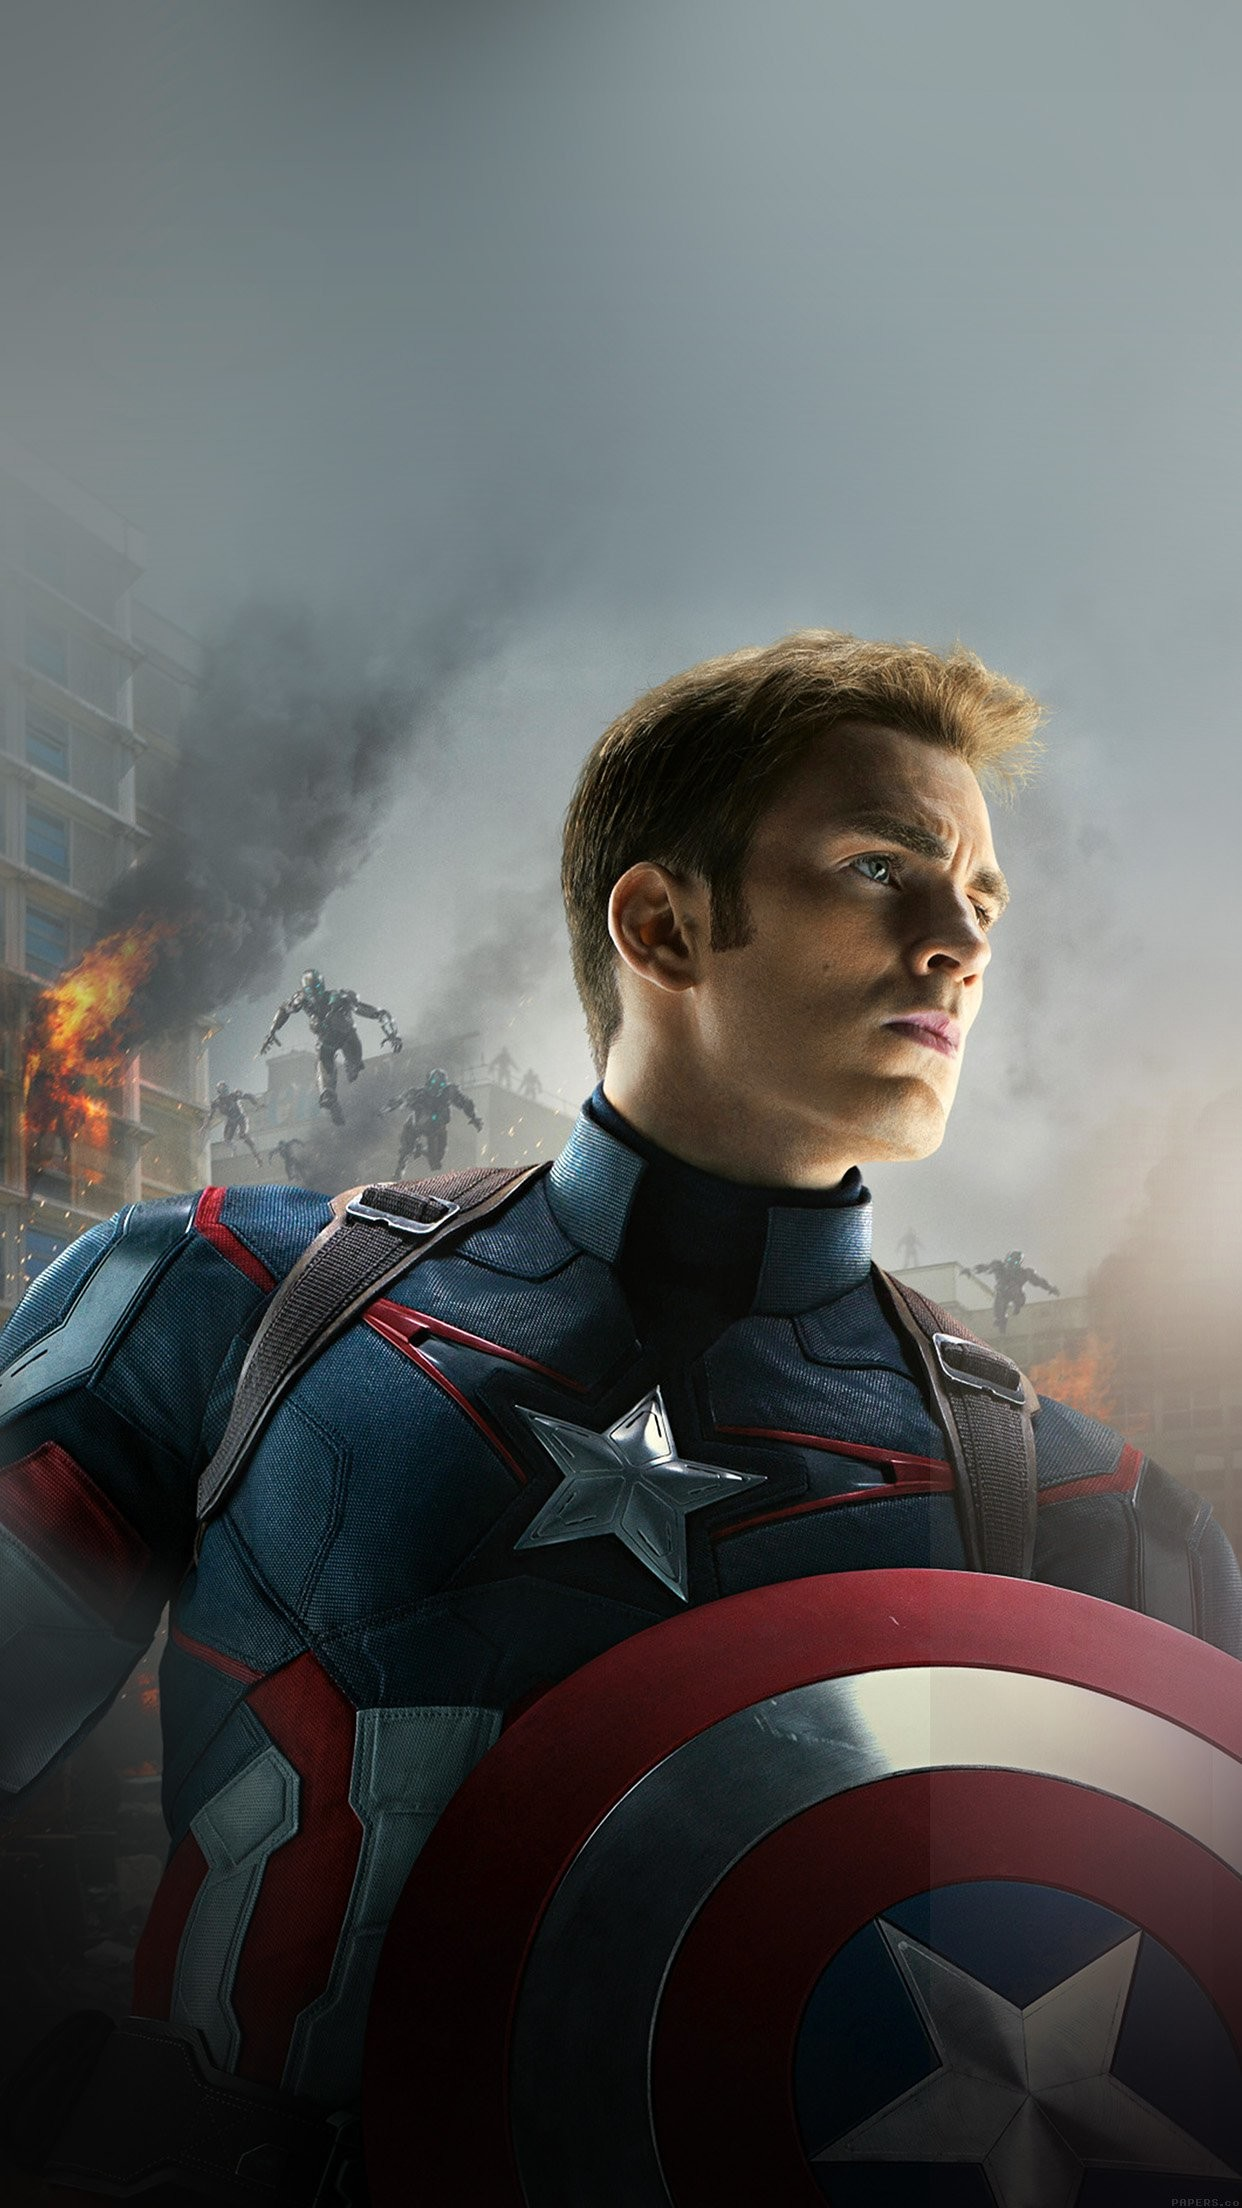 avengers age of ultron captain america chris evans iPhone 7 wallpaper